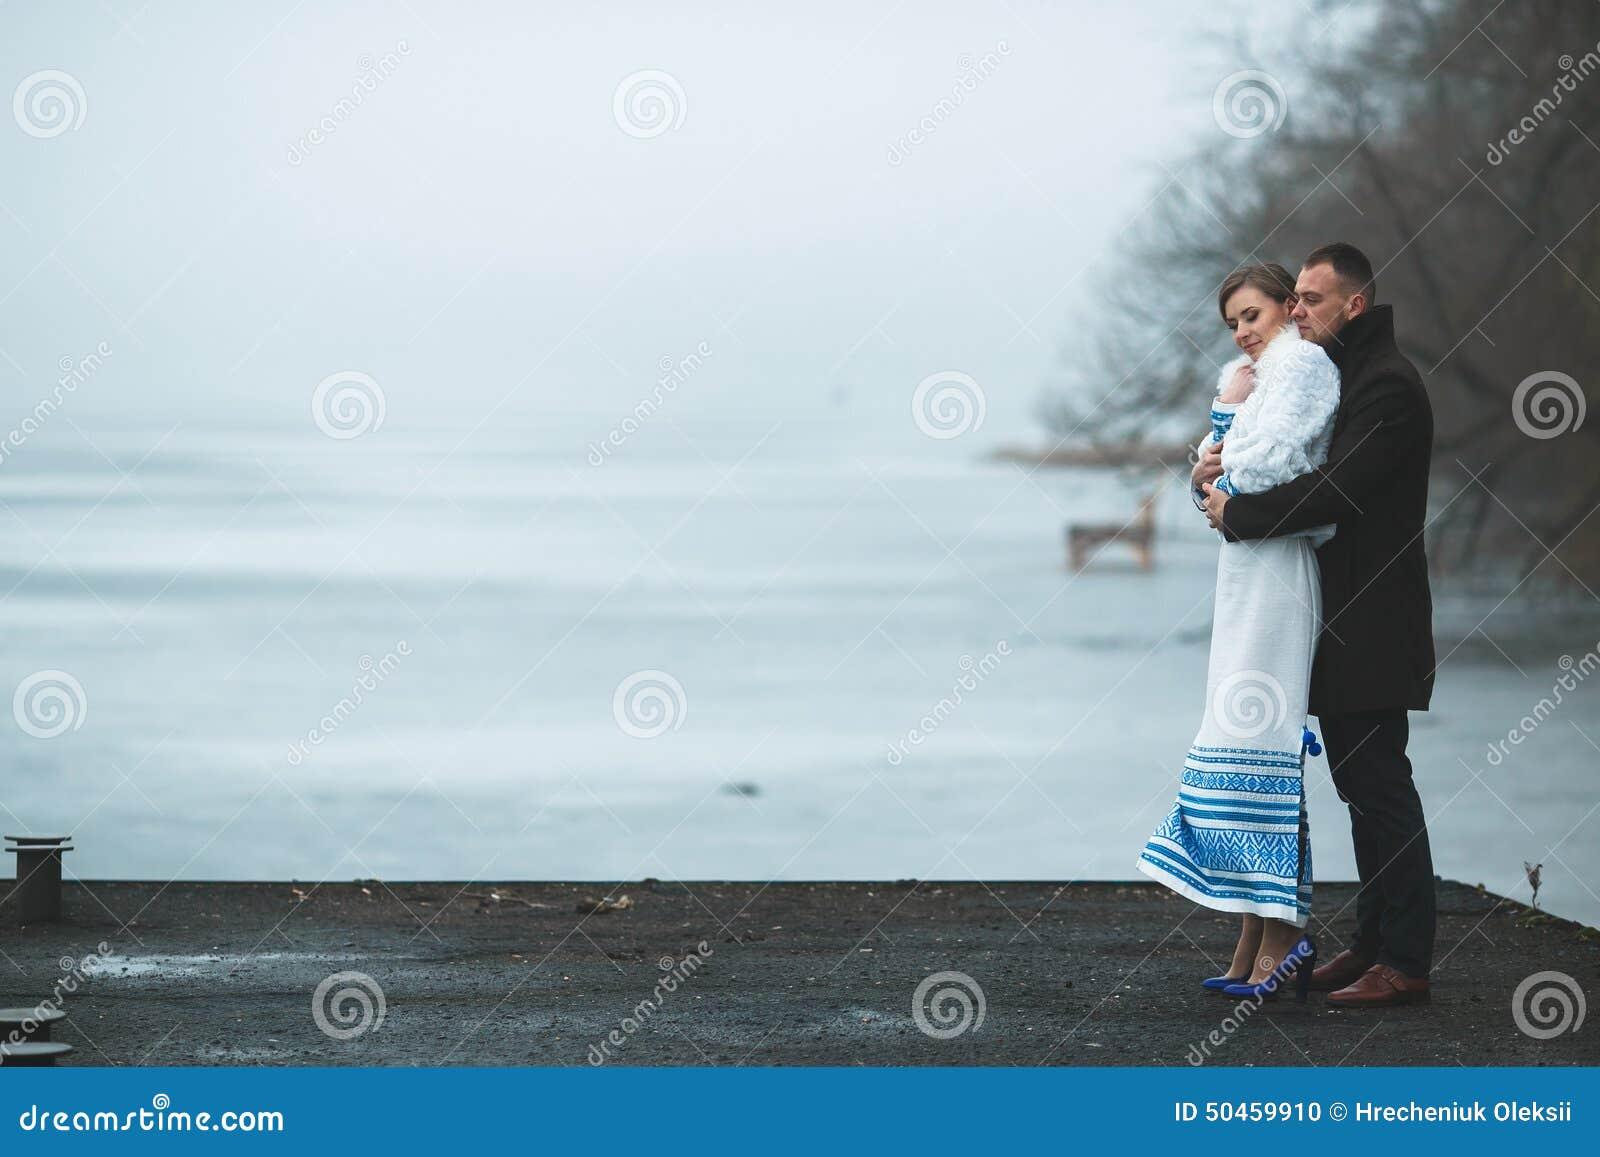 Piękna para na doku w zimy mgle